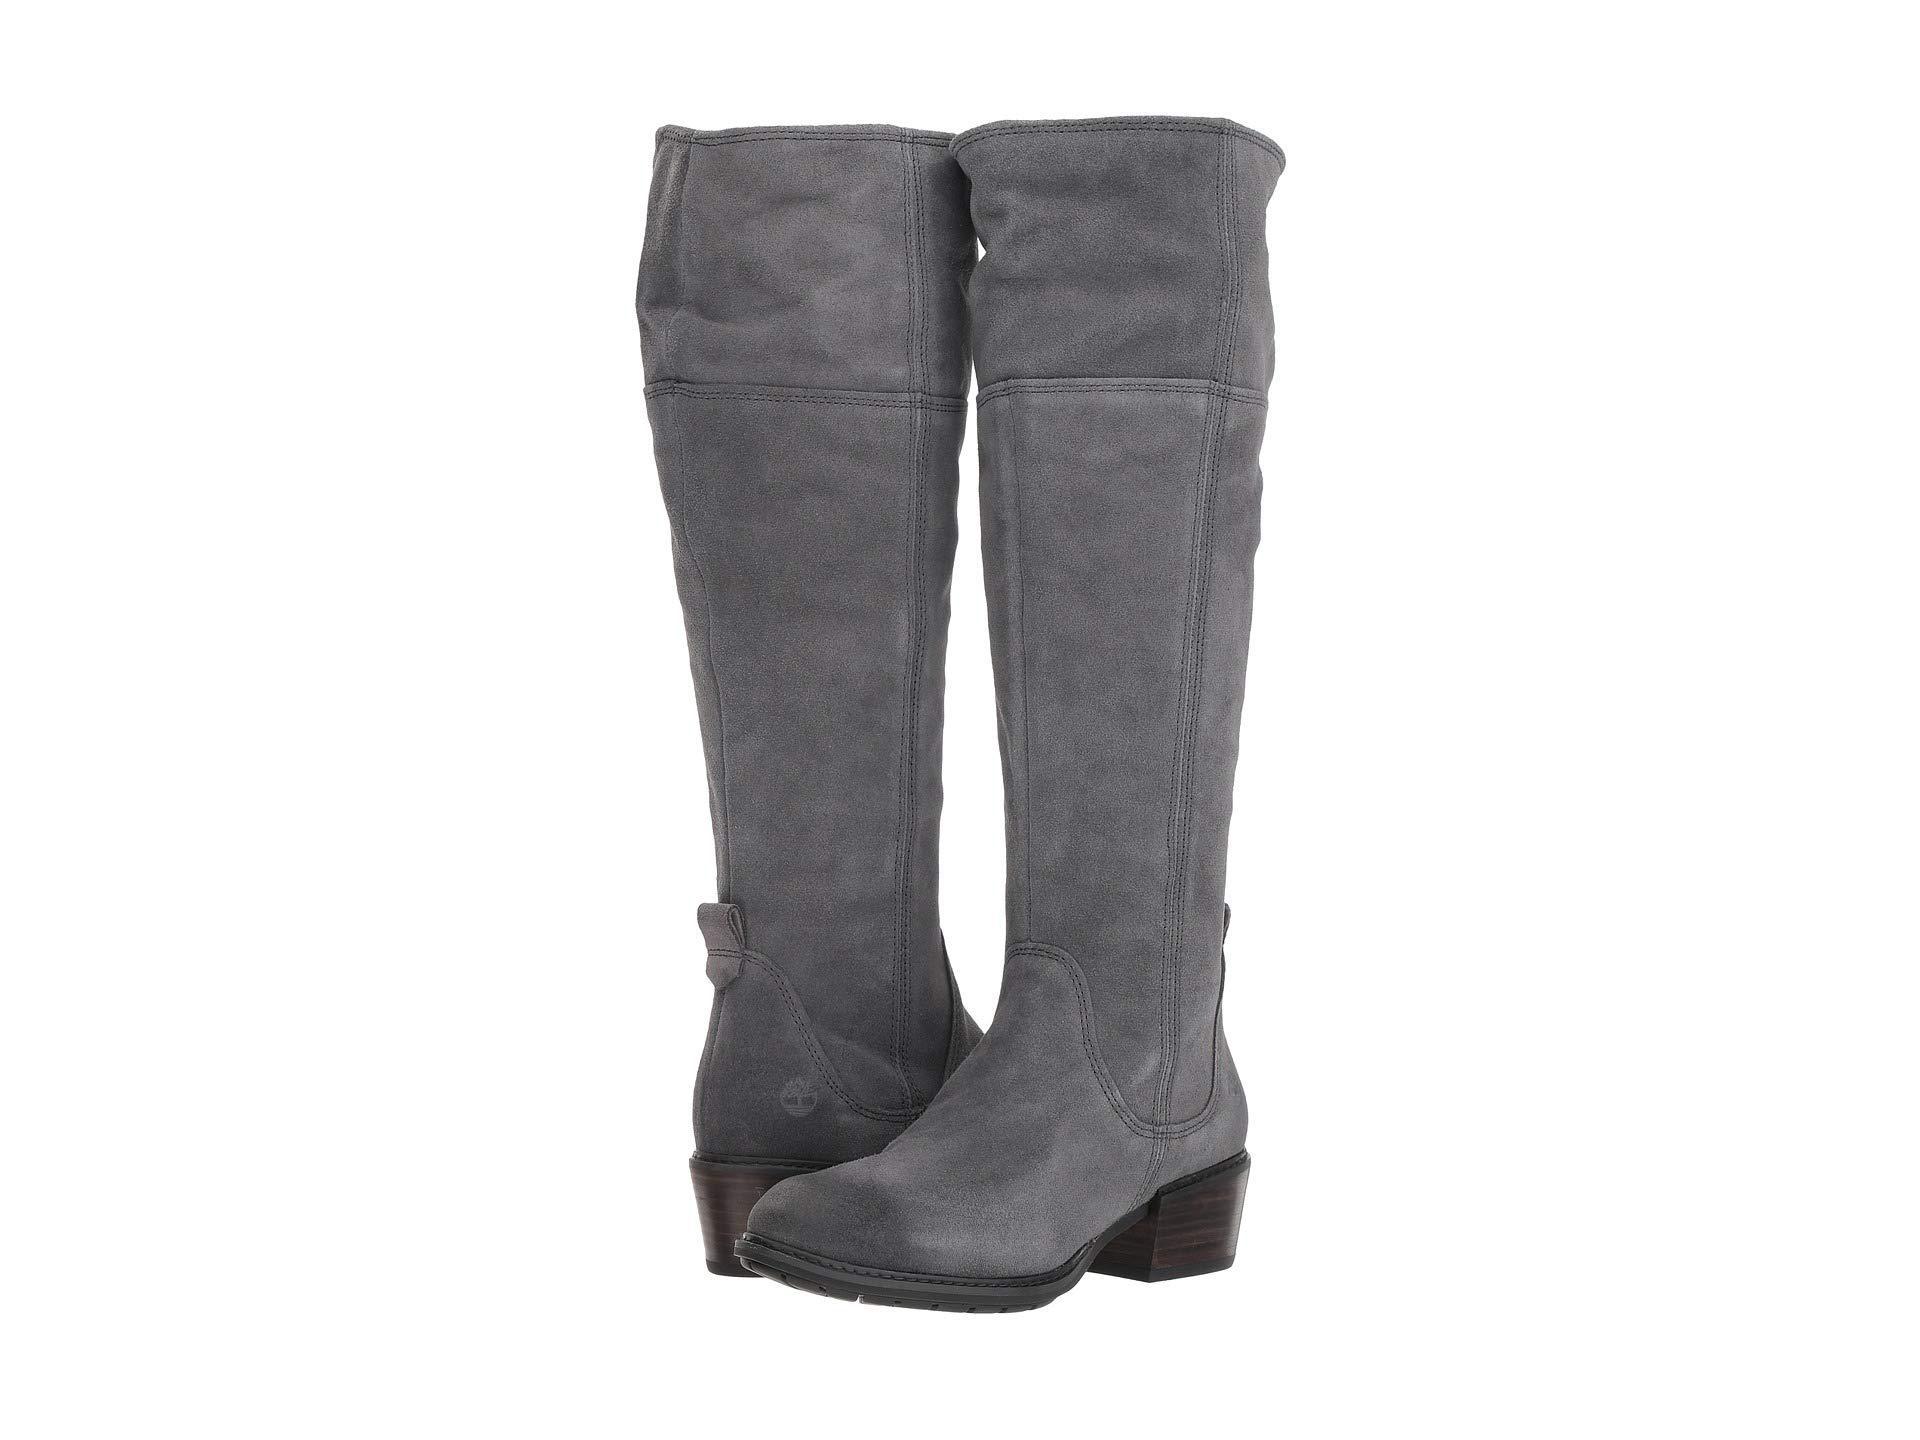 Sutherlin Bay Tall Boot Knee High